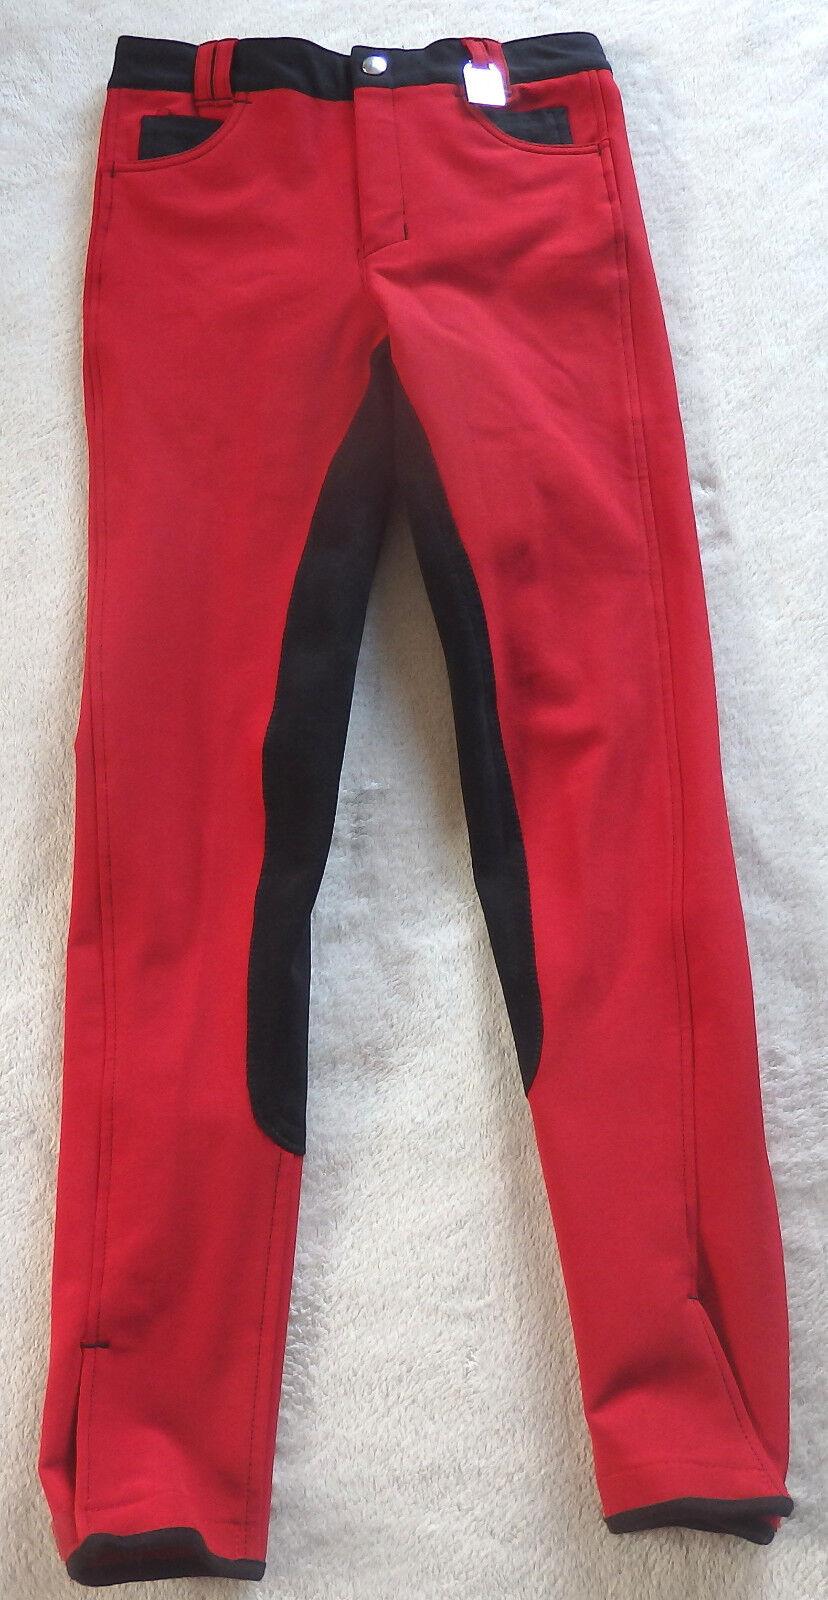 Kyron Kinder Reithose, 3 4 Vollbesatz,red,Gr 158, SIXTY, slim-line (78)